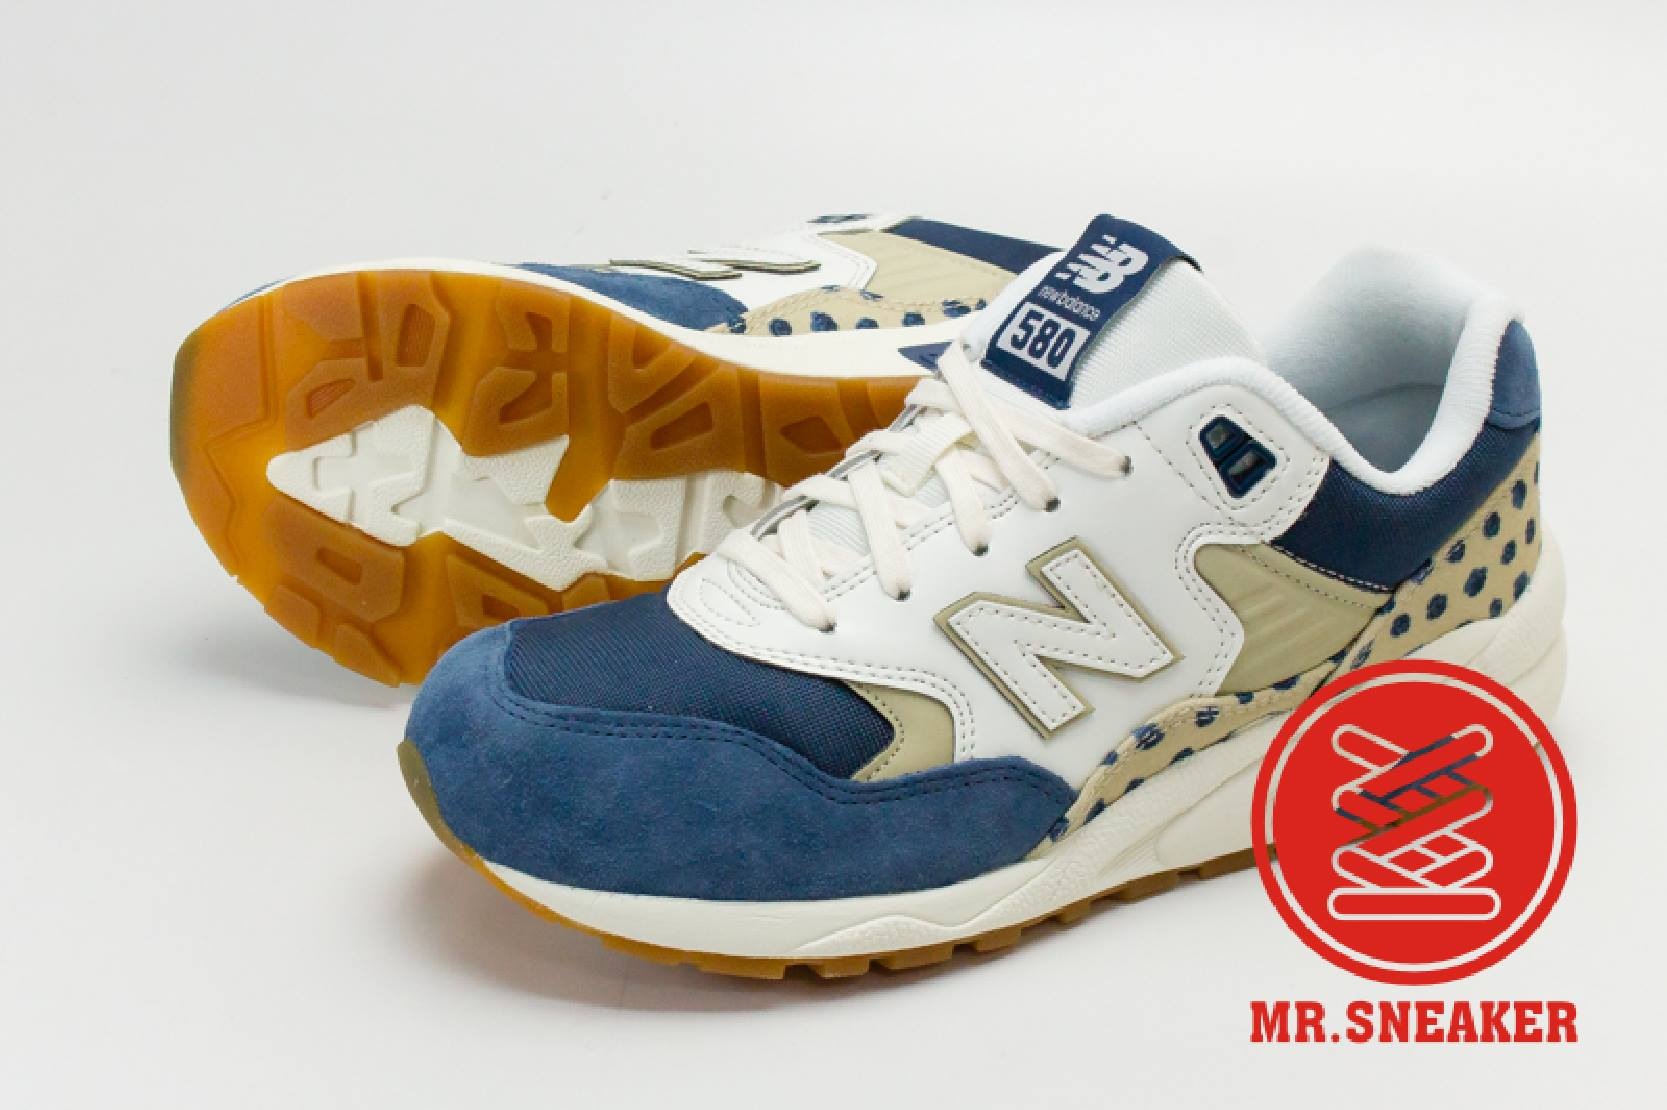 ☆Mr.Sneaker☆ NEW BALANCE WRT580 海軍藍 KITCH FLORAL 波爾卡點